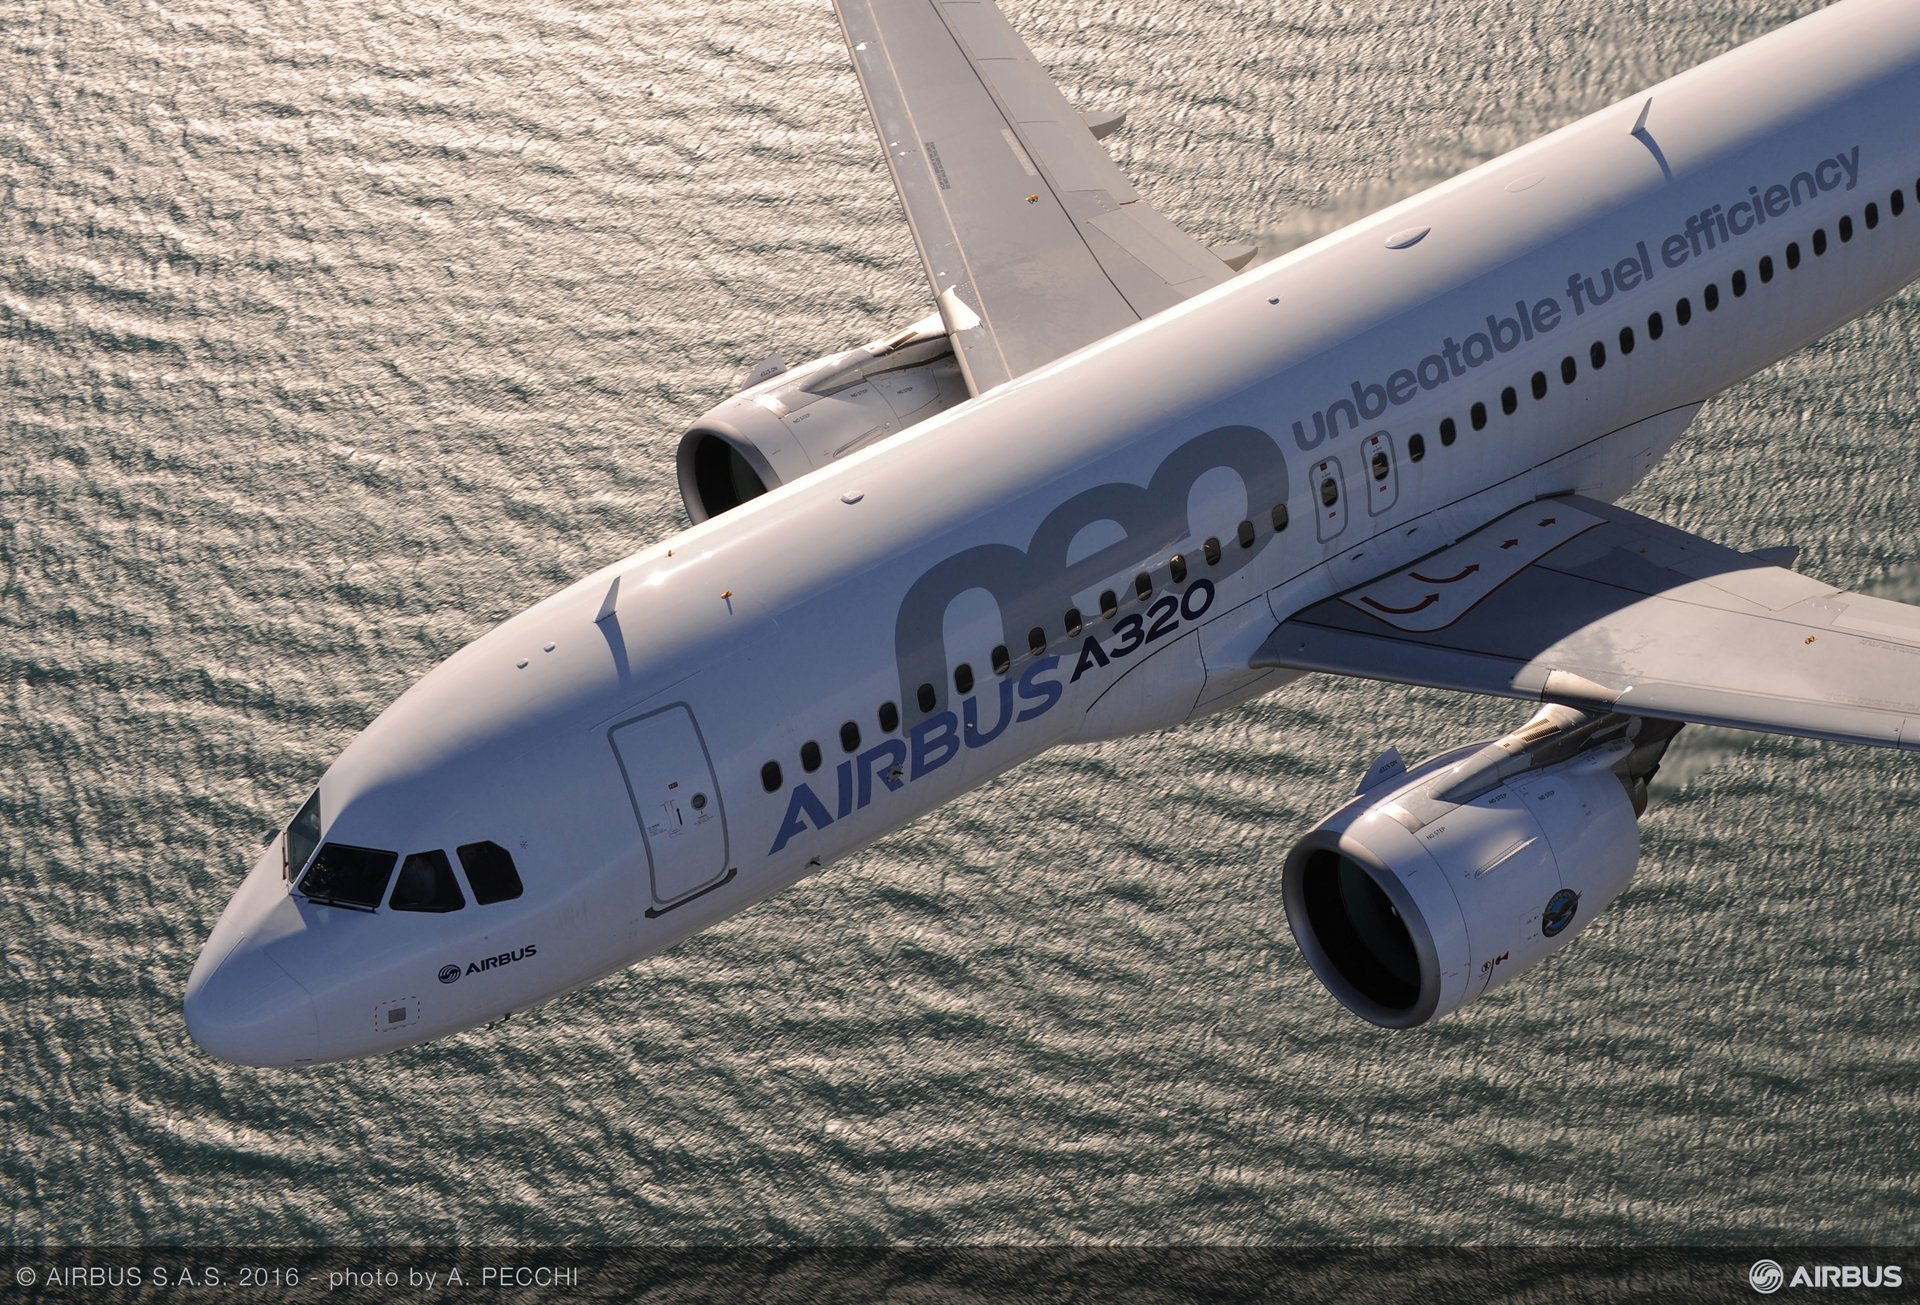 A320neo with Pratt & Whitney engines